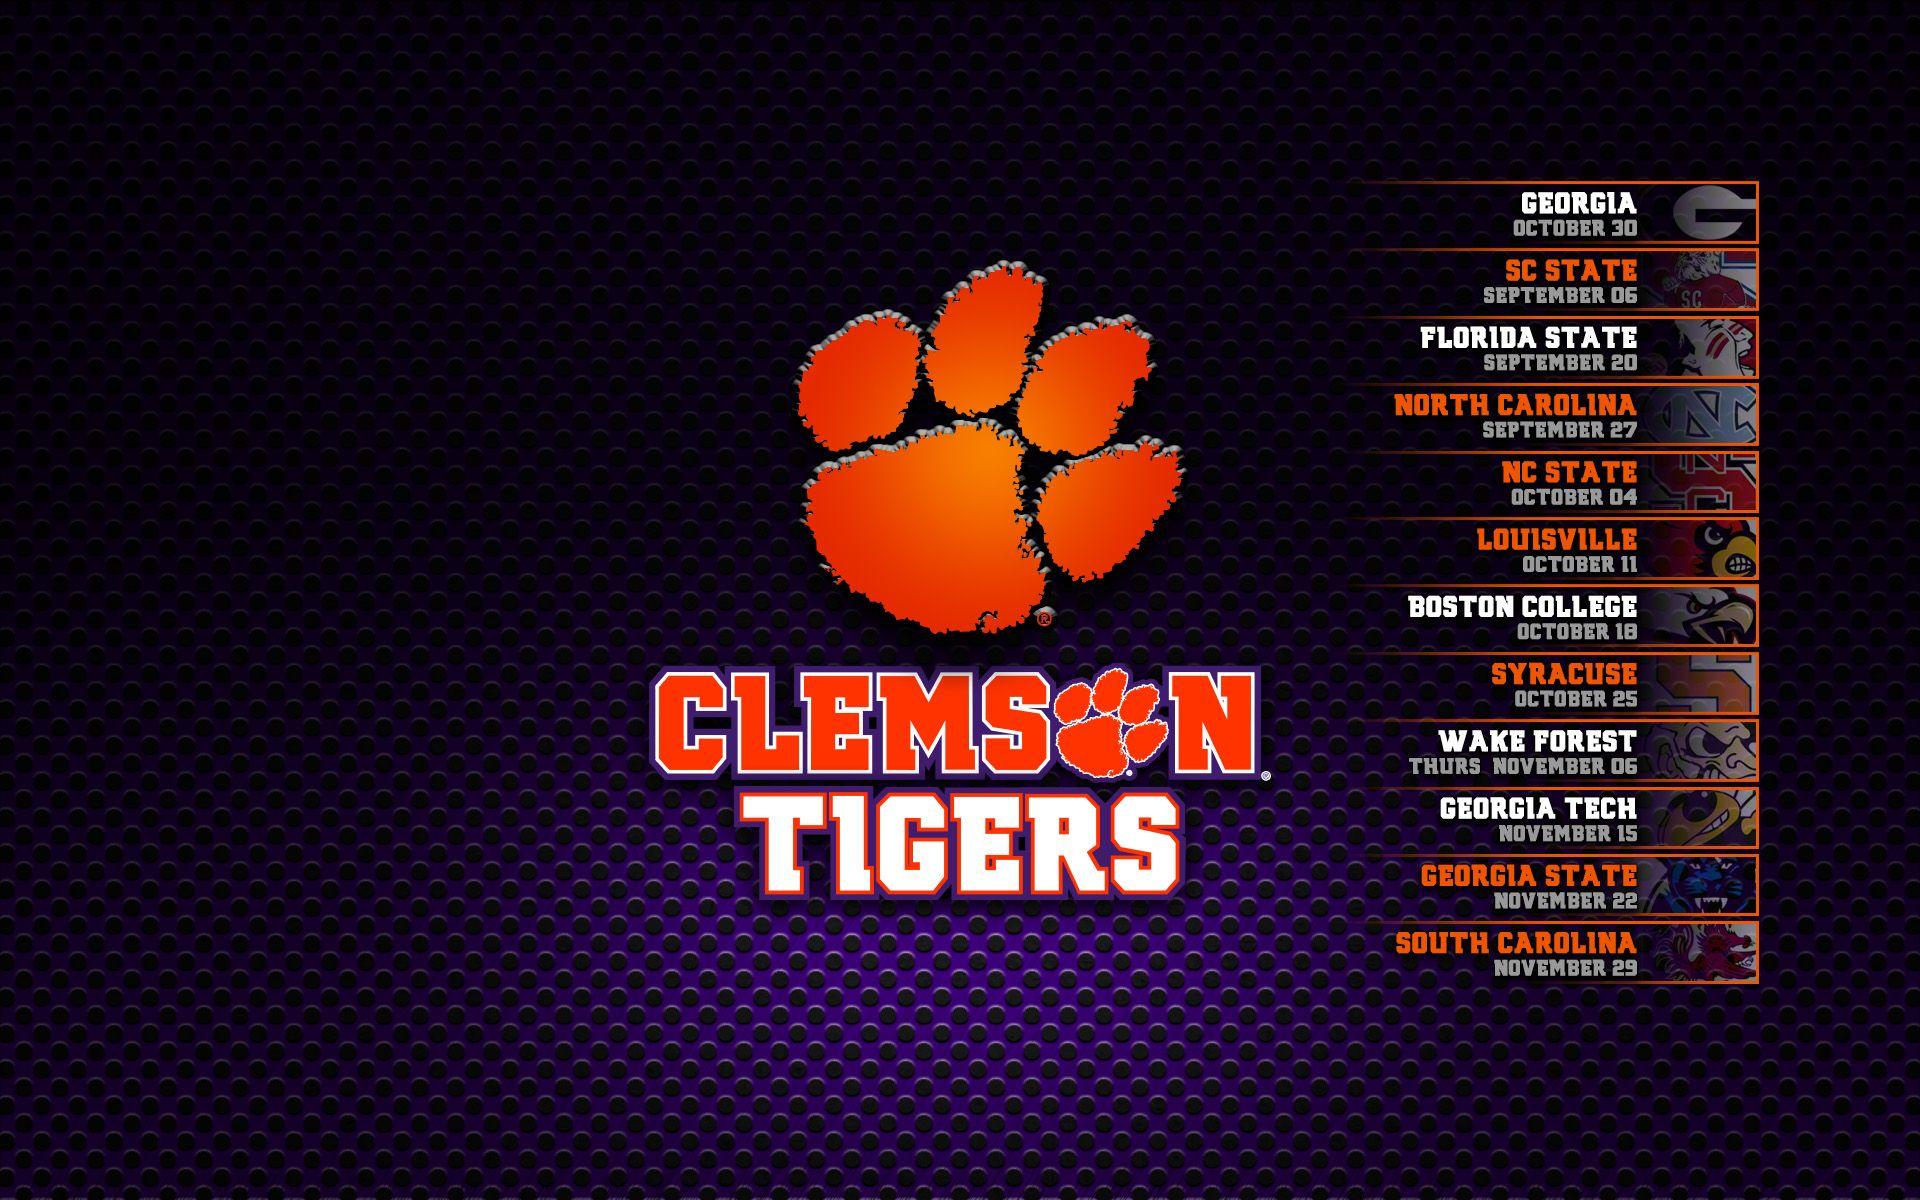 Clemson Tigers Football Schedule 2014 (4) Clemson